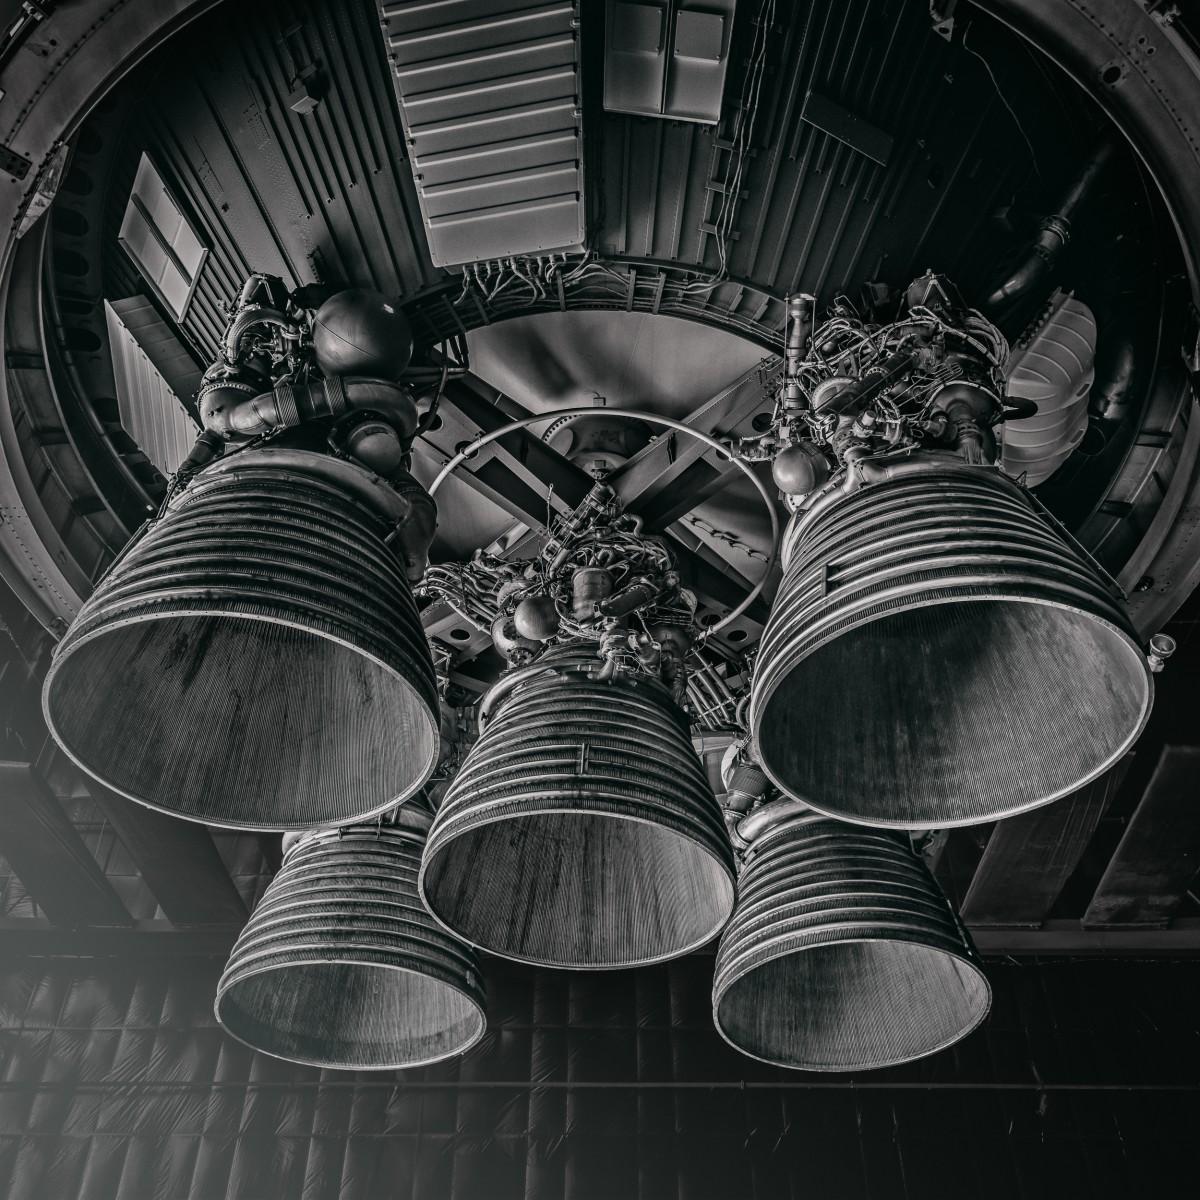 Saturn V #6 by Morgan Silk